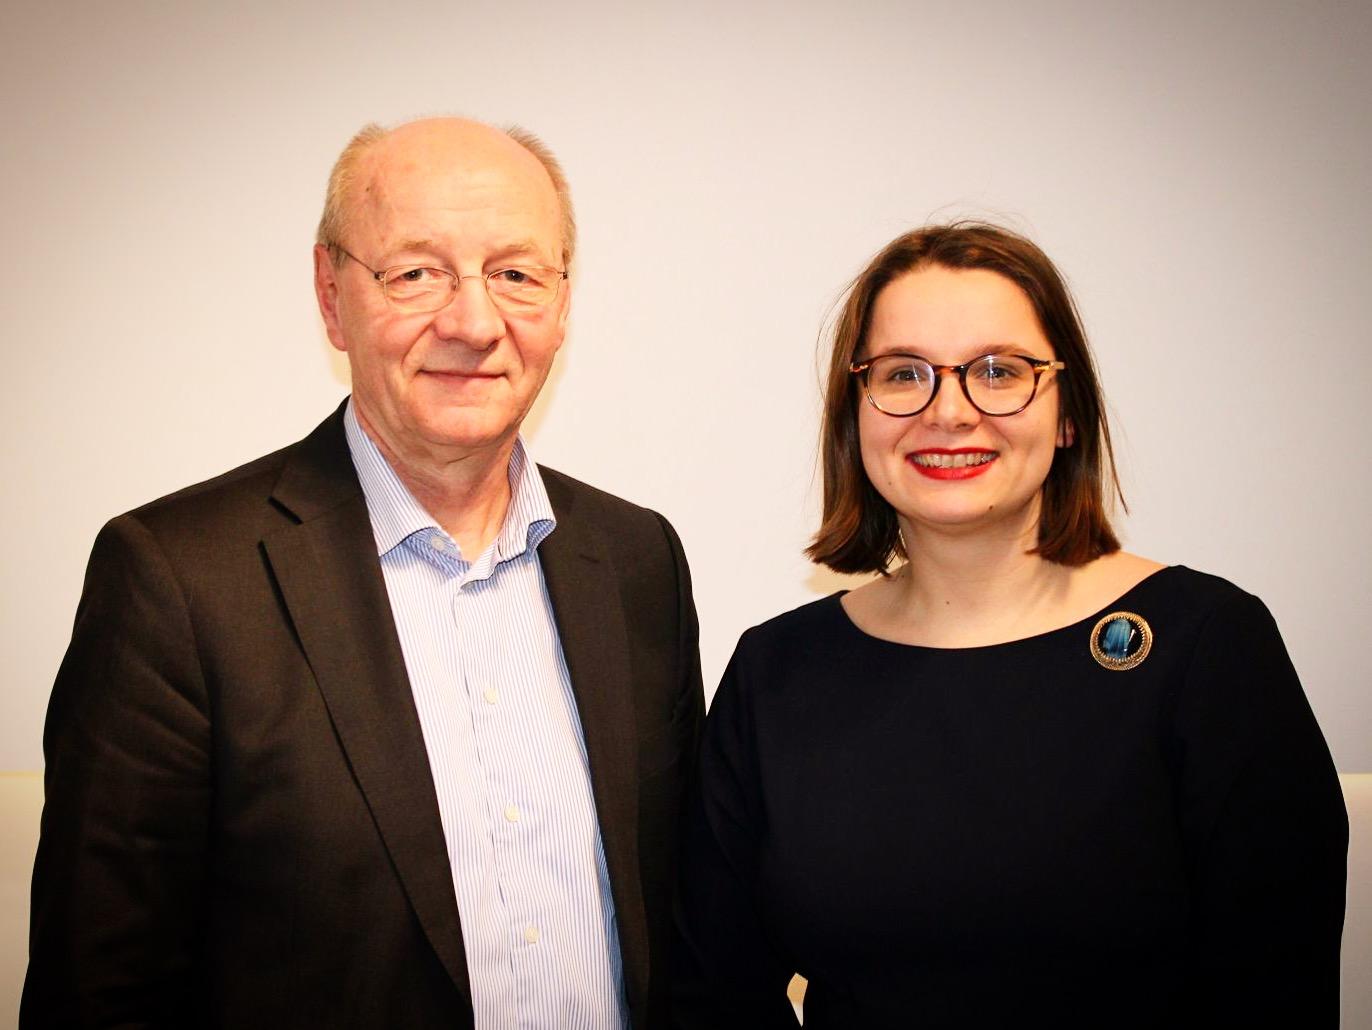 Image for Presentation of the EU Coalition Explorer with Josef Janning